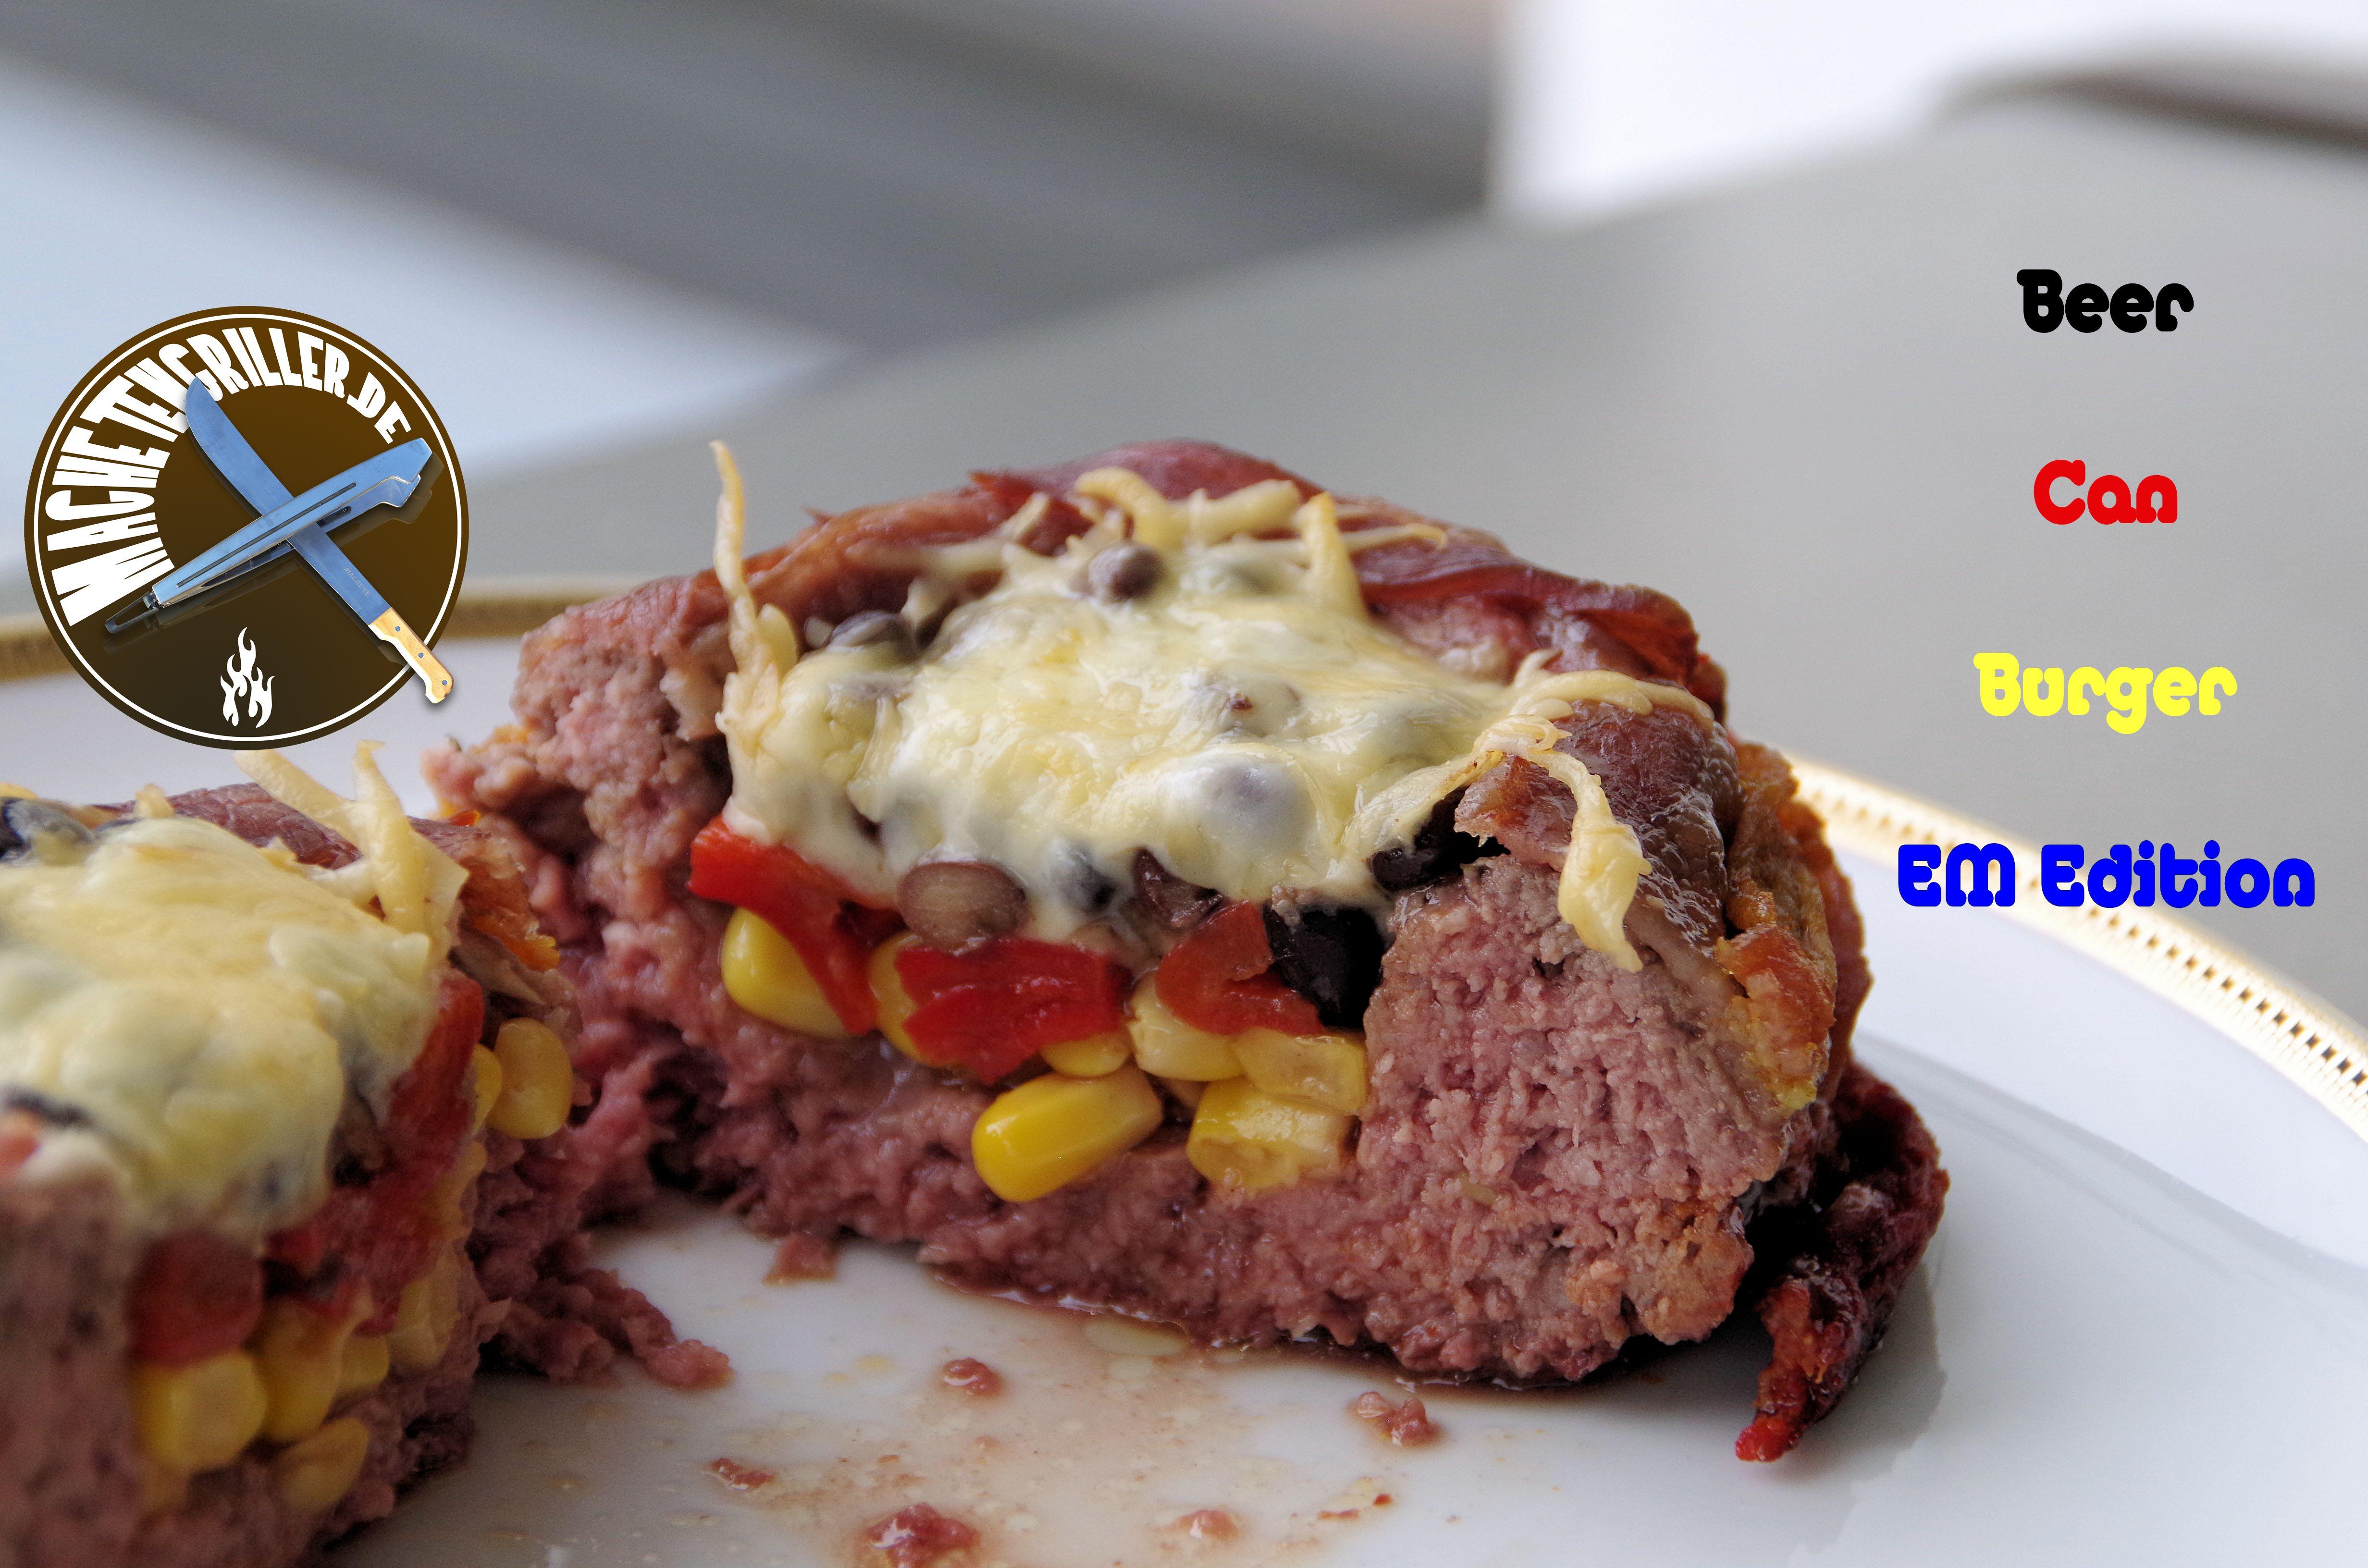 Beercan Burger